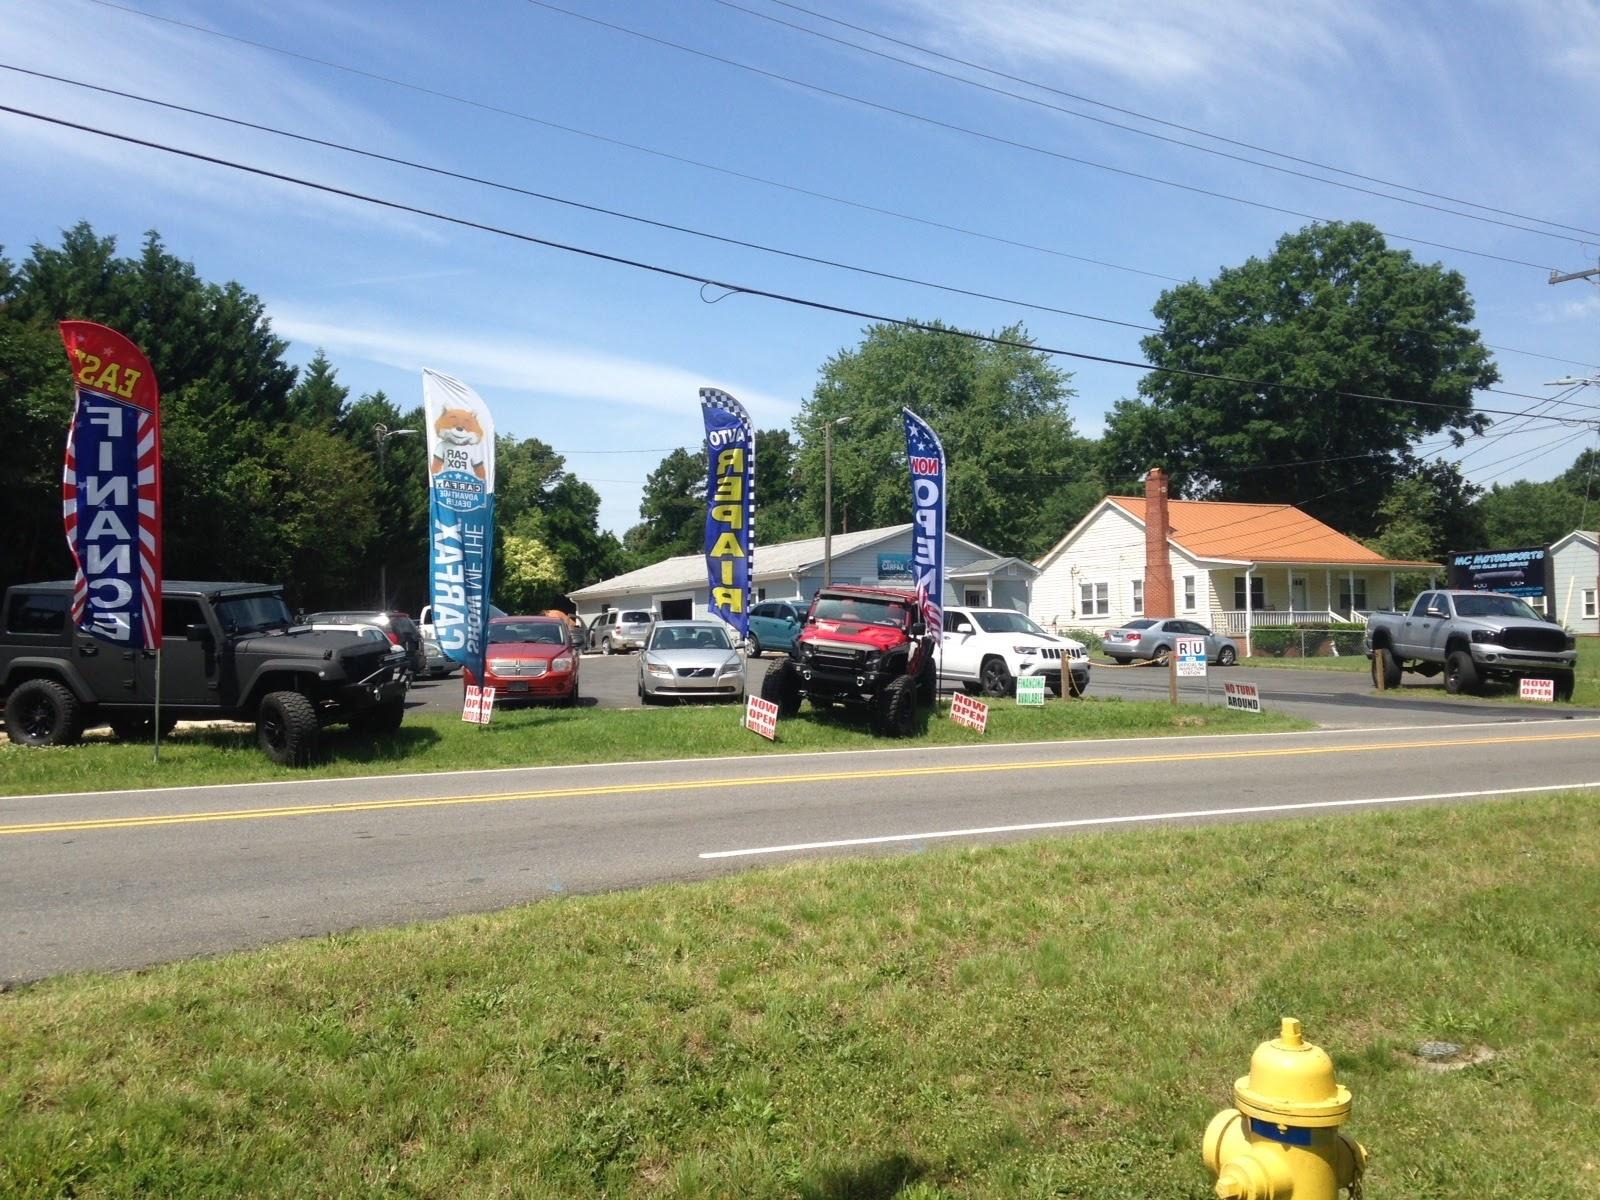 Gmc Dealership Charlotte Nc >> MC Motorsports Inc - Mooresville, NC: Read Consumer ...